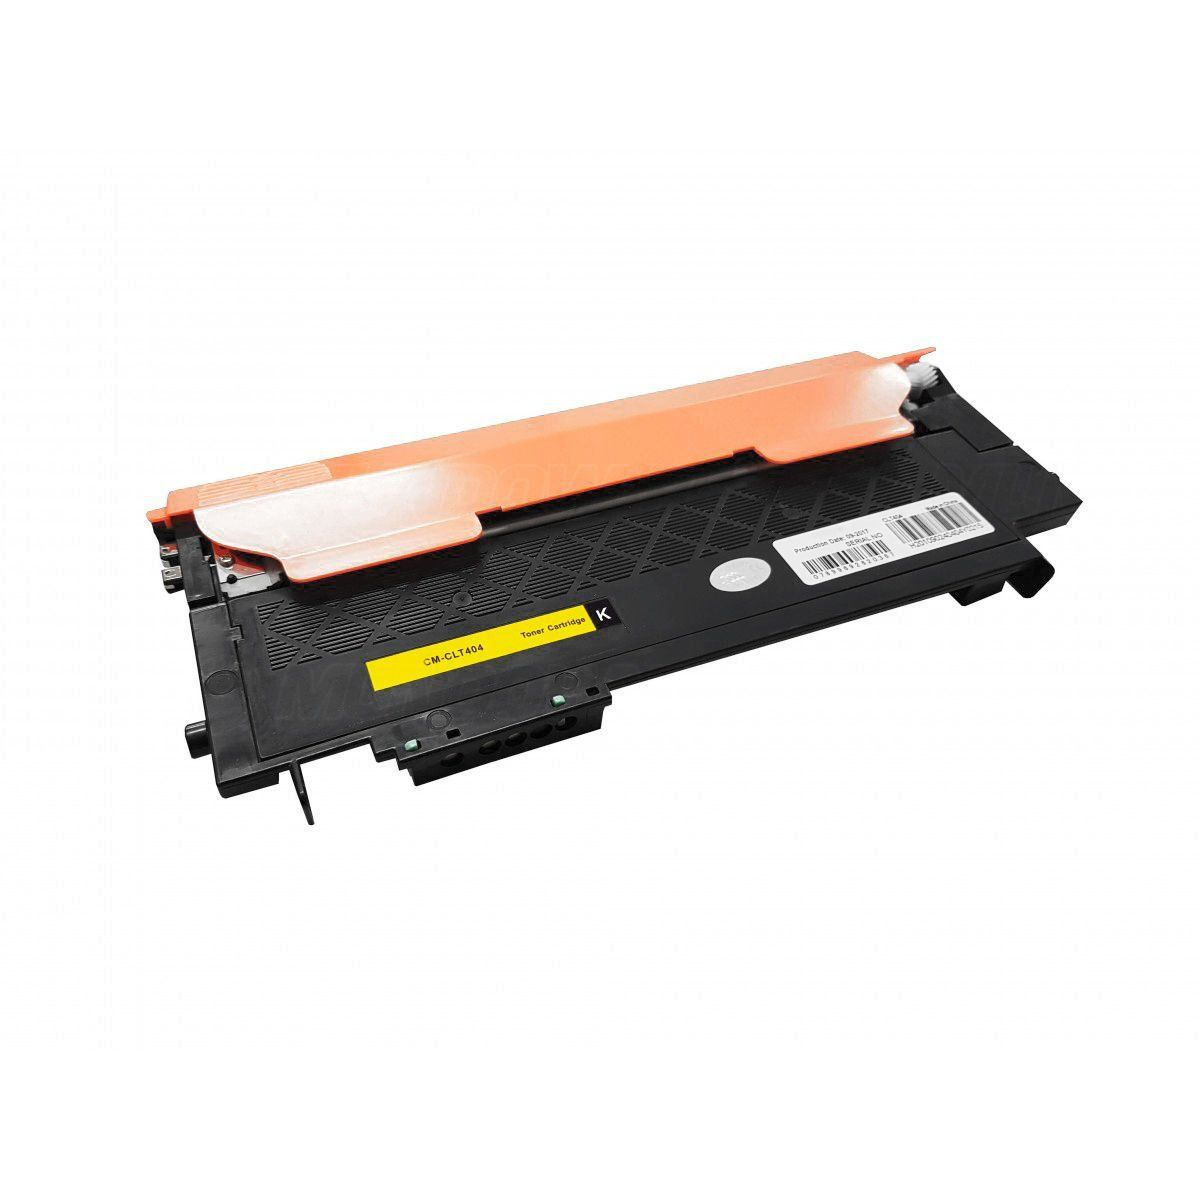 Compatível: Toner CLT-404 K404 para impressora Samsung SL-C430 C430w C480 C480w C480fn C480fw / Preto / 1.500